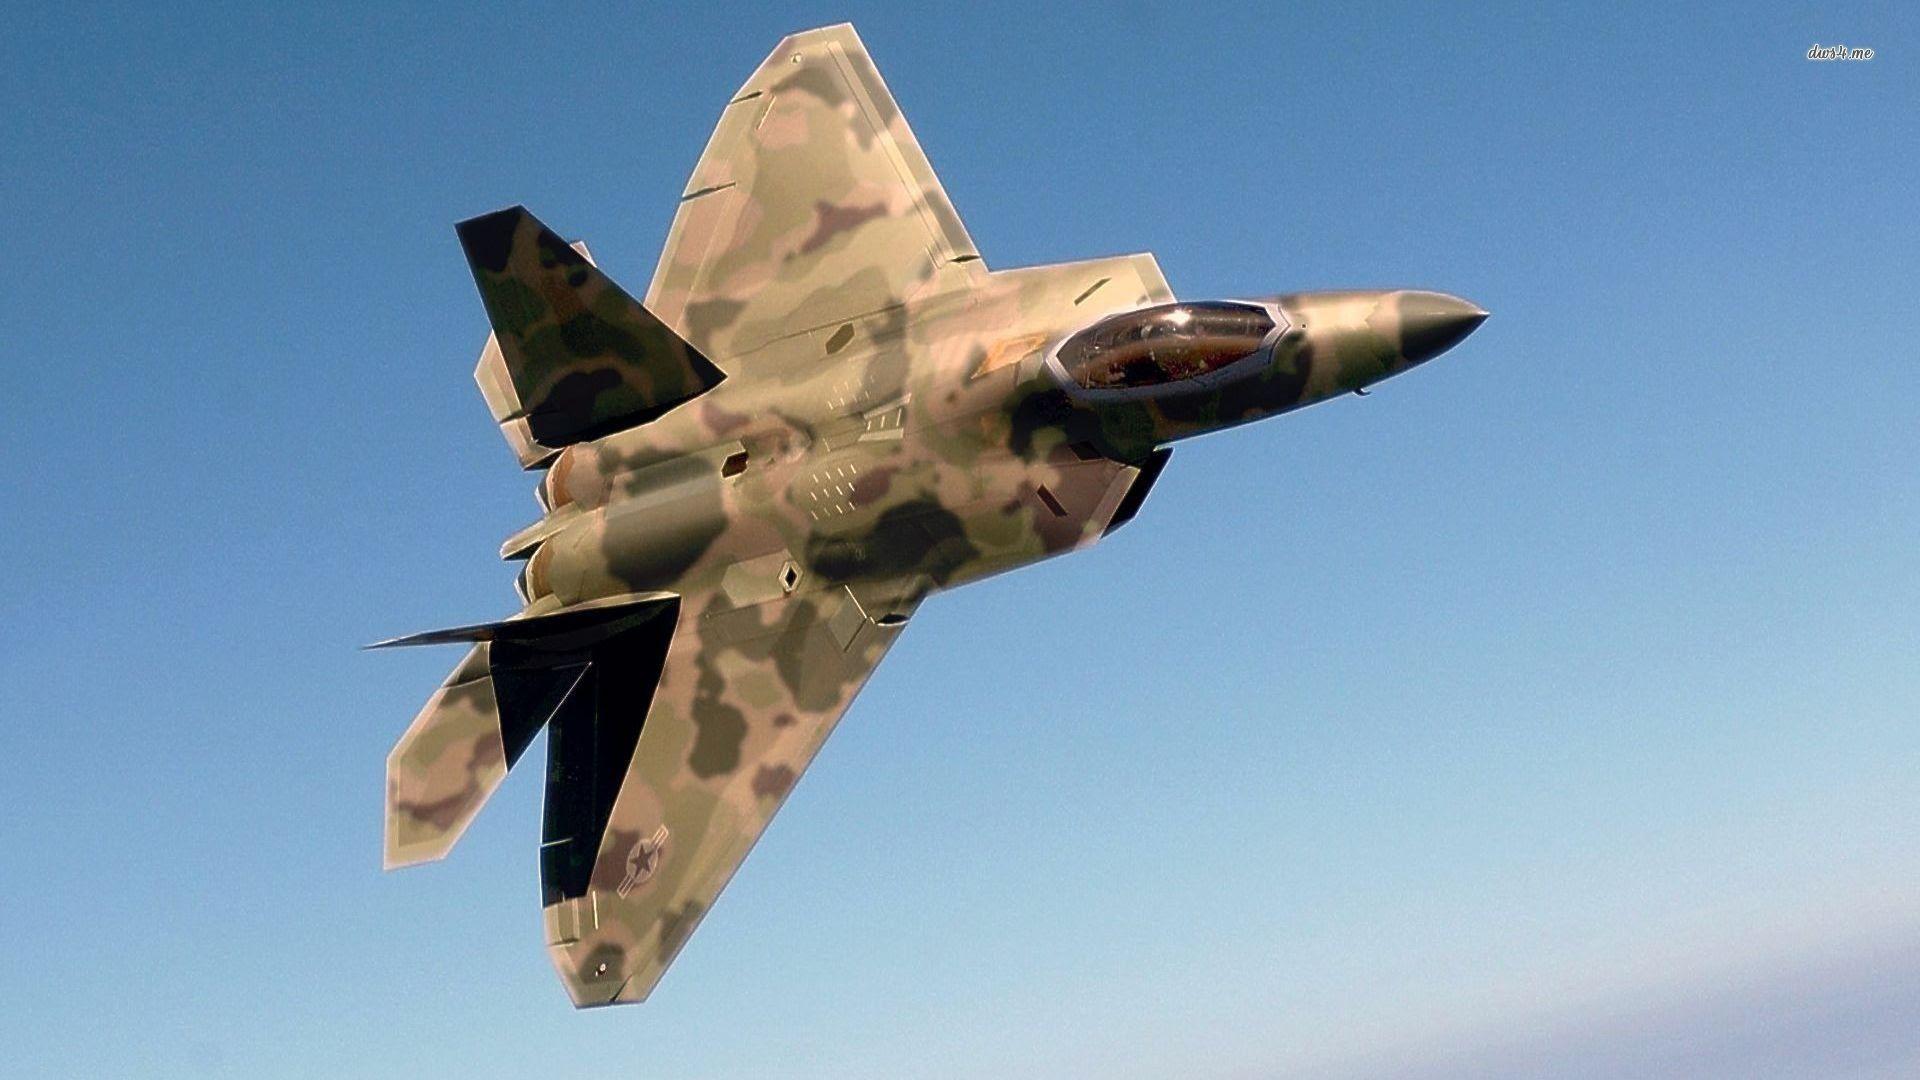 Lockheed Martin F 22 Raptor Wallpapers Mobile Fighter Jets Aircraft Raptors Wallpaper